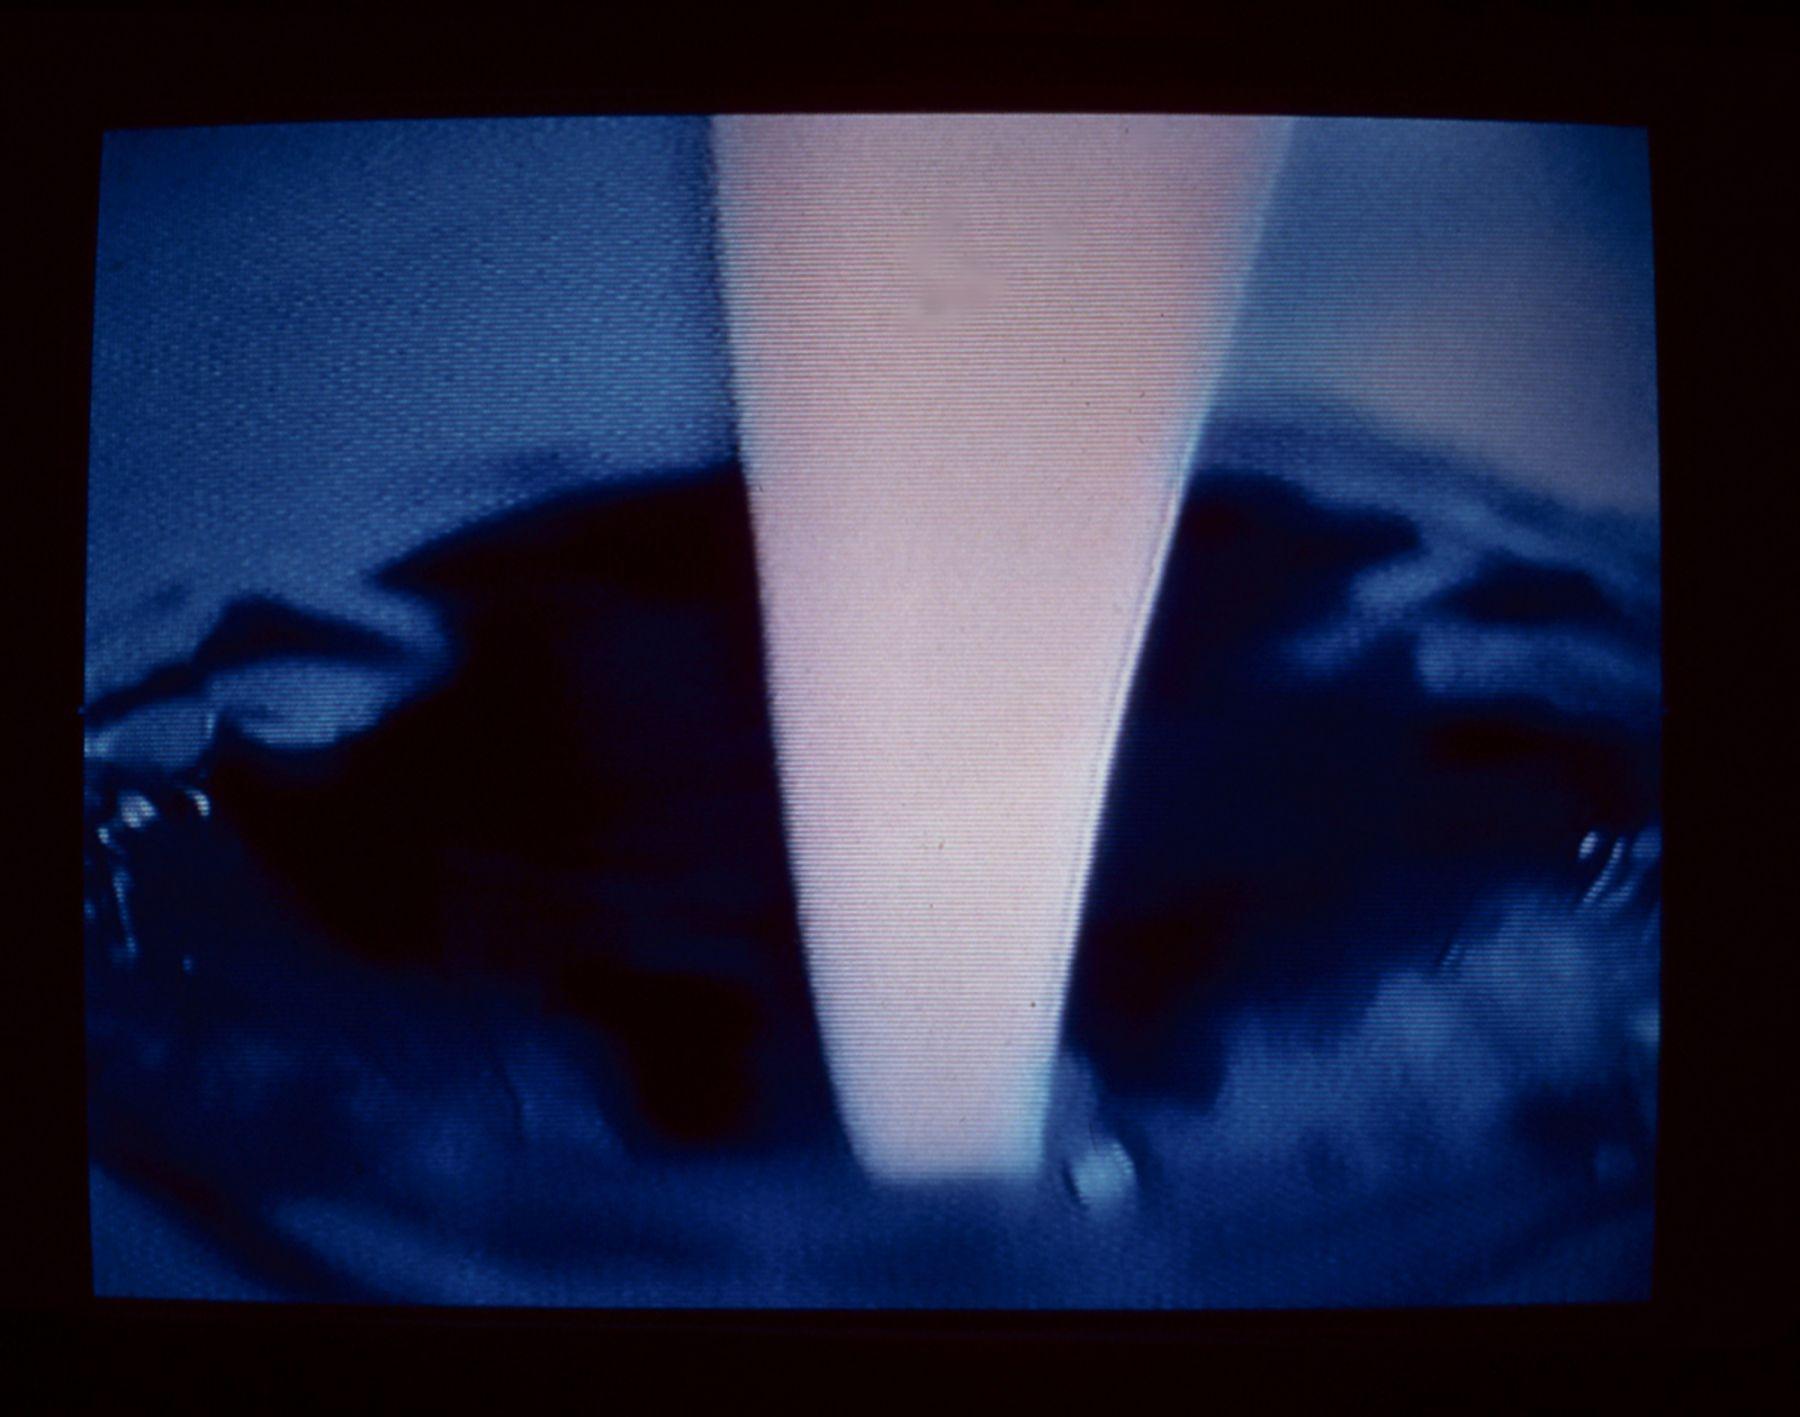 Daniel Pflumm Icetrain, 1998 VHS tape still 7 minutes